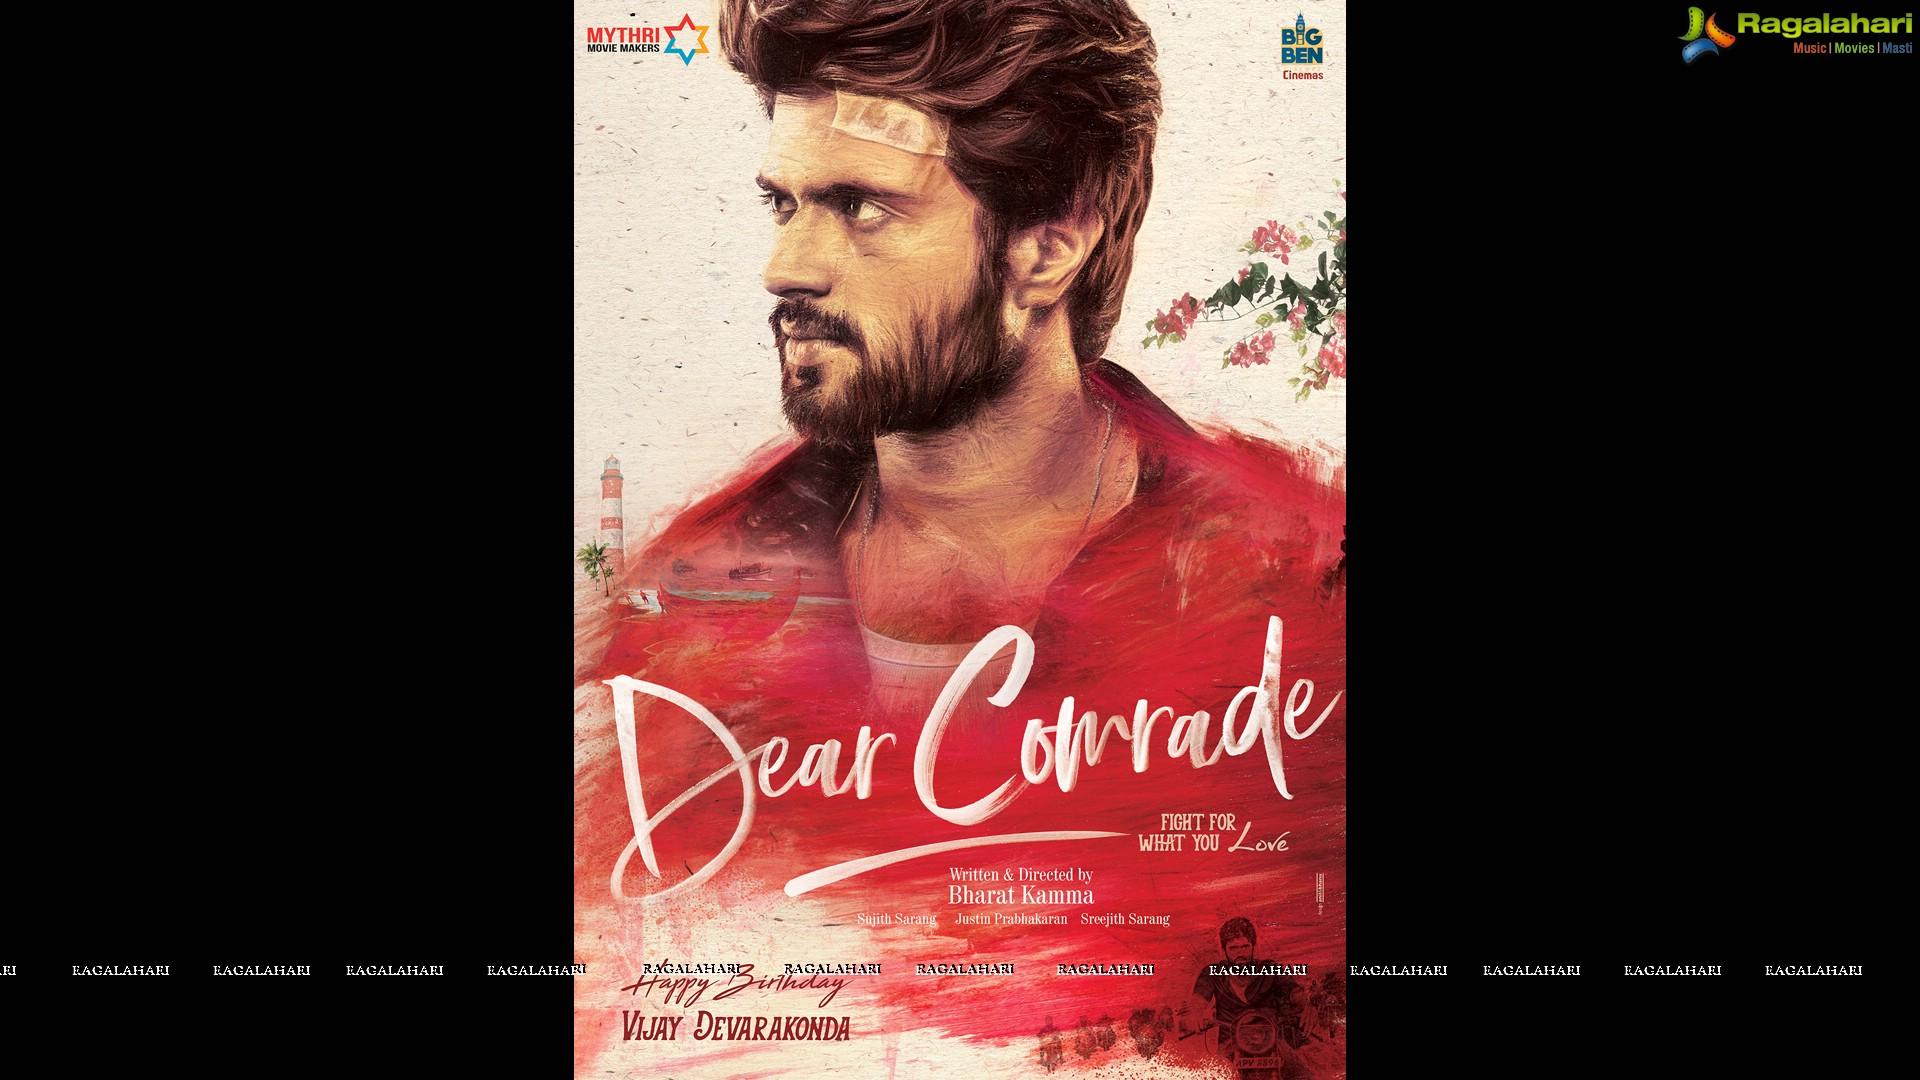 Dear Comrade Movie Posters